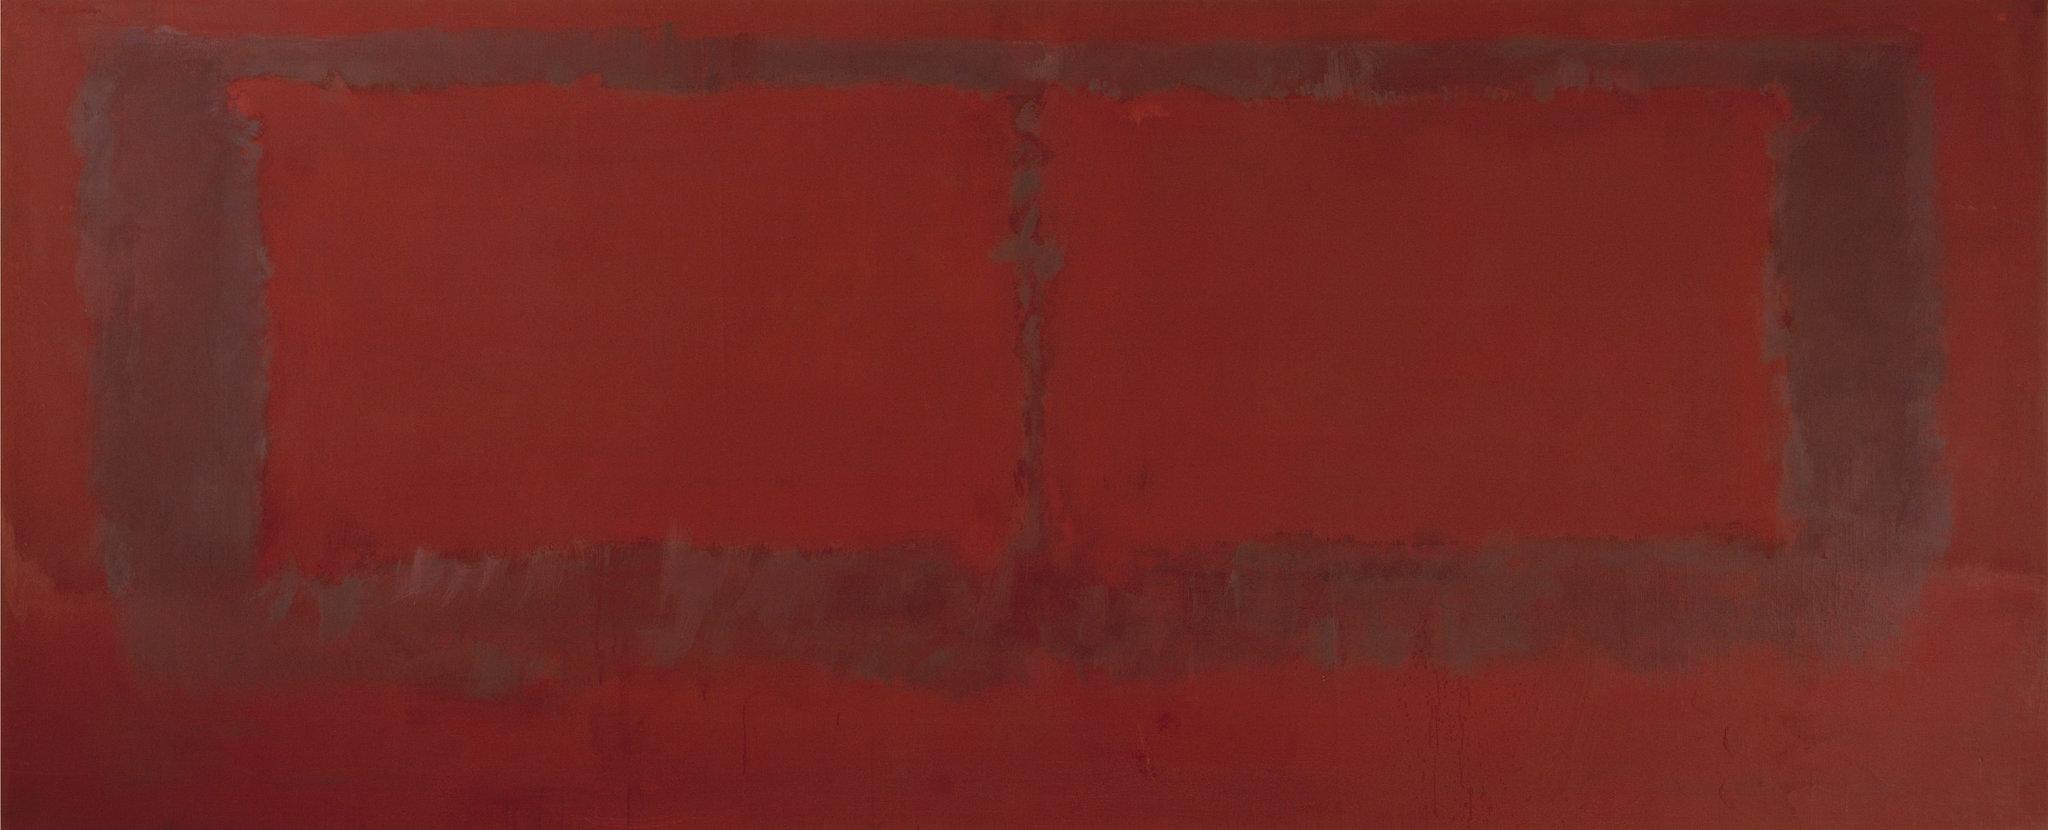 Mark Rothko S Dark Palette Illuminated The New York Times